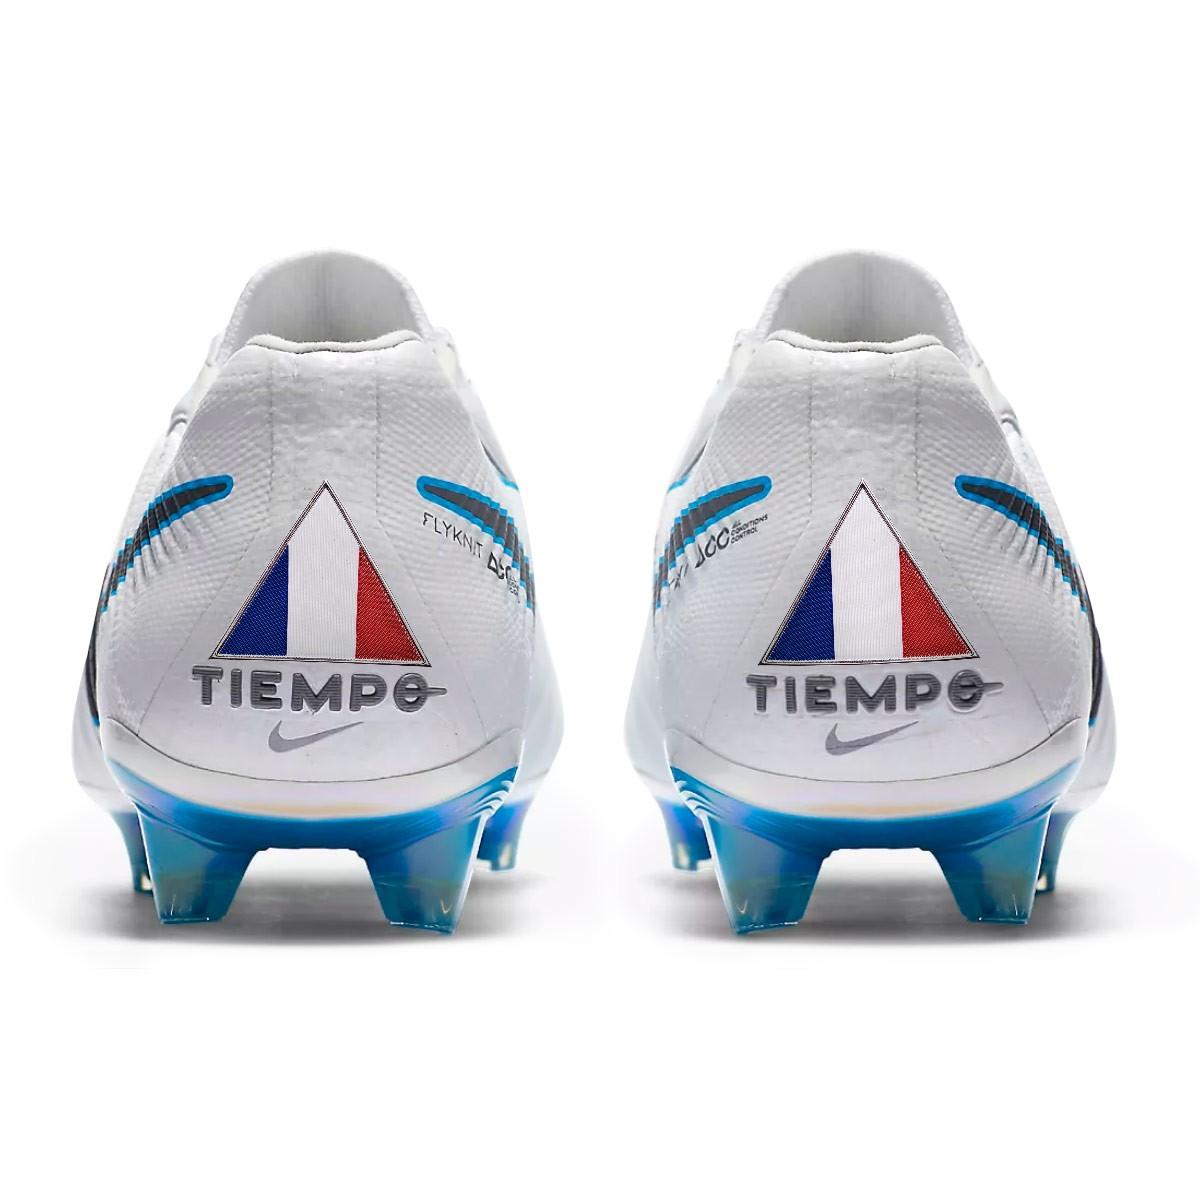 check out d0307 46d8d Boot Nike Kids Tiempo Legend VII Elite FG White-Metallic cool grey-Blue  hero - Soloporteros es ahora Fútbol Emotion